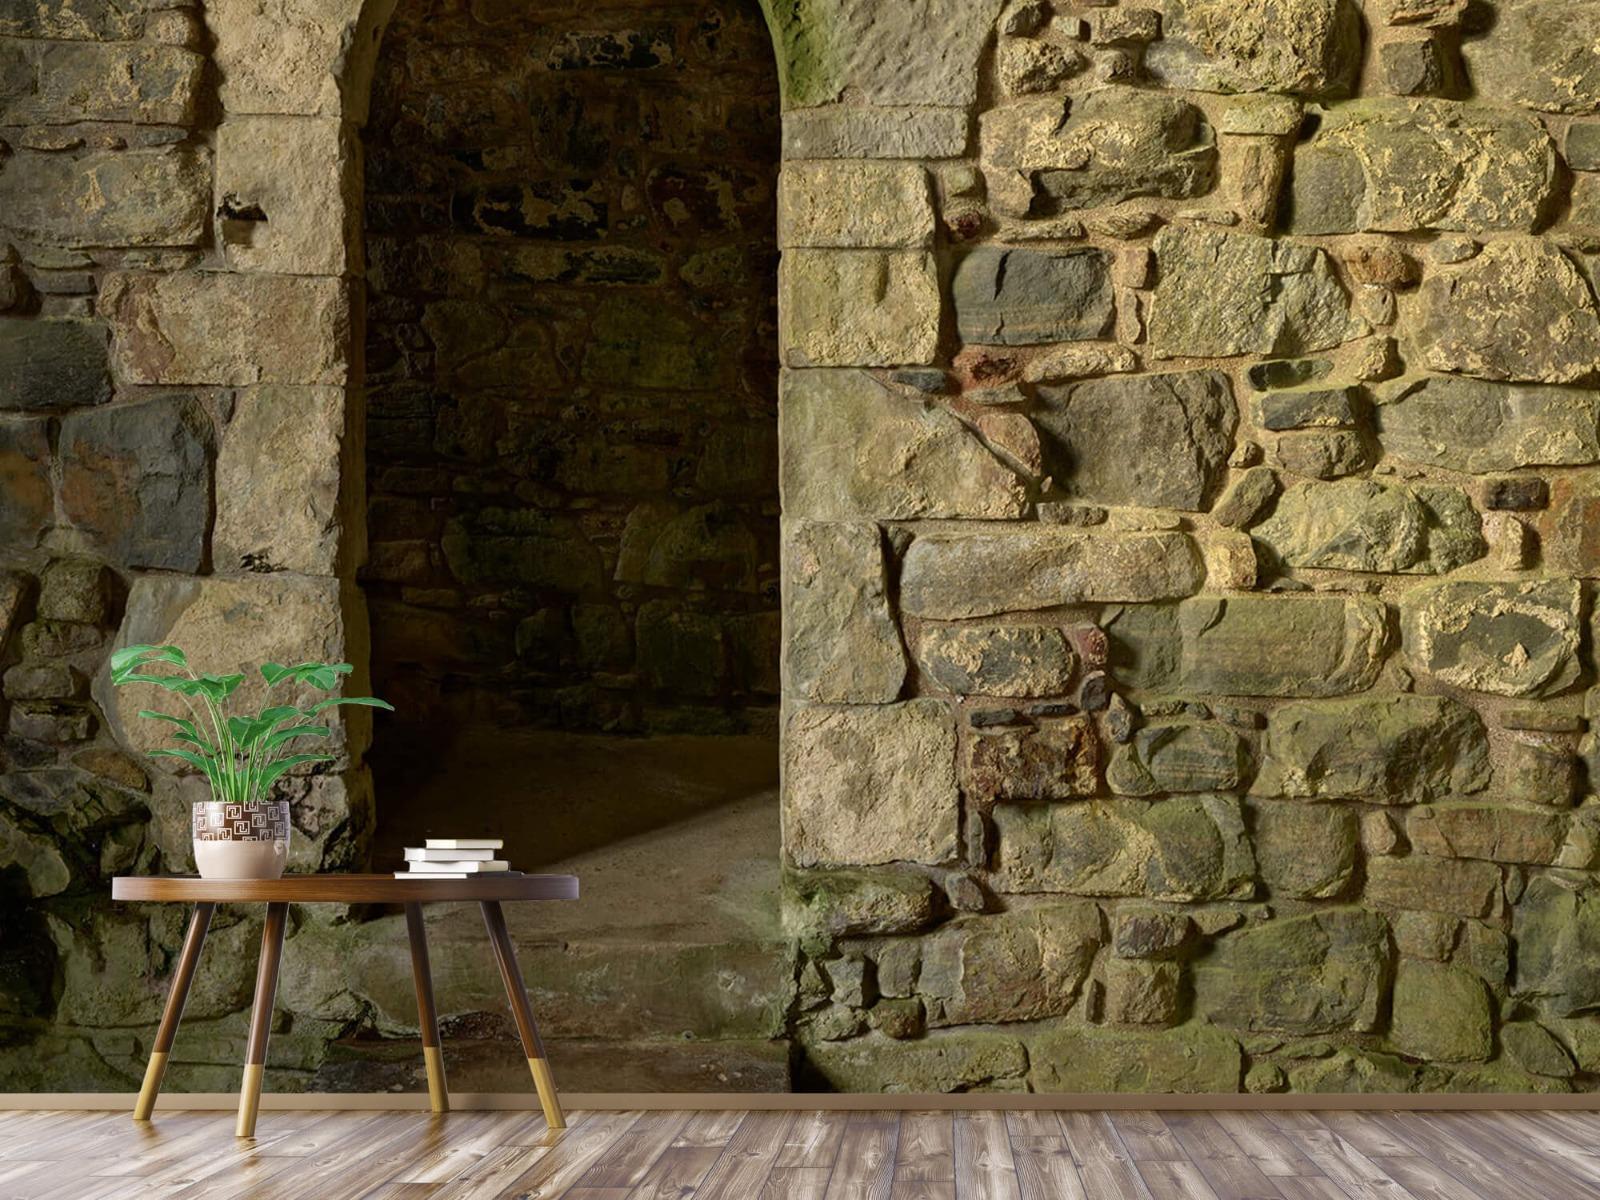 Steen behang - Oude muur met doorgang - Slaapkamer 4